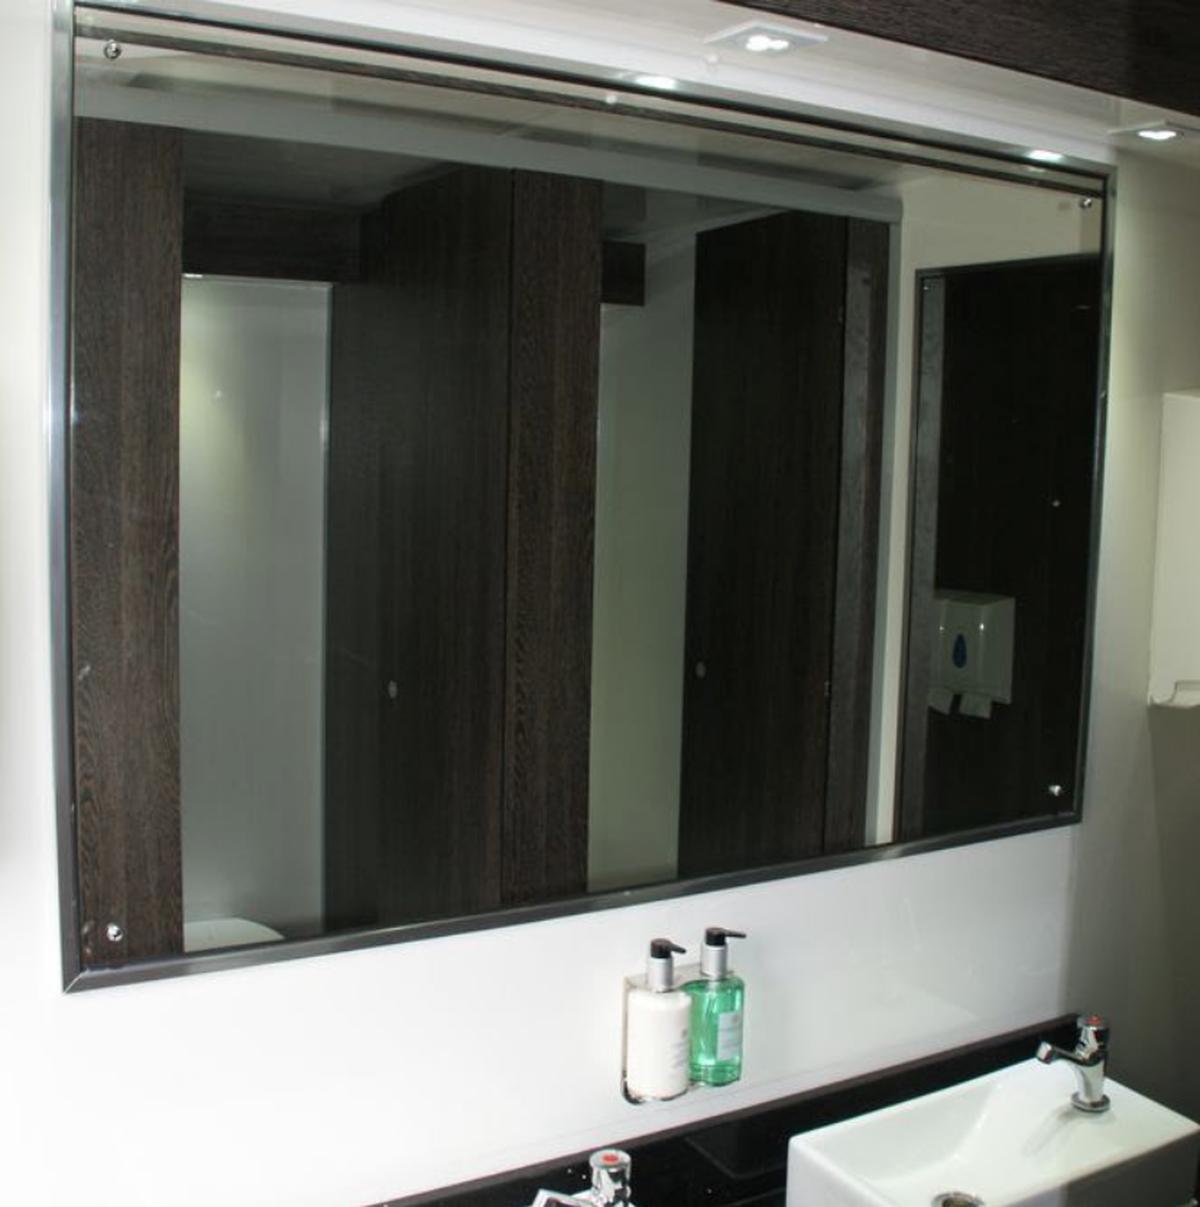 Secondhand Toilet Units 3 1 Toilet Trailers